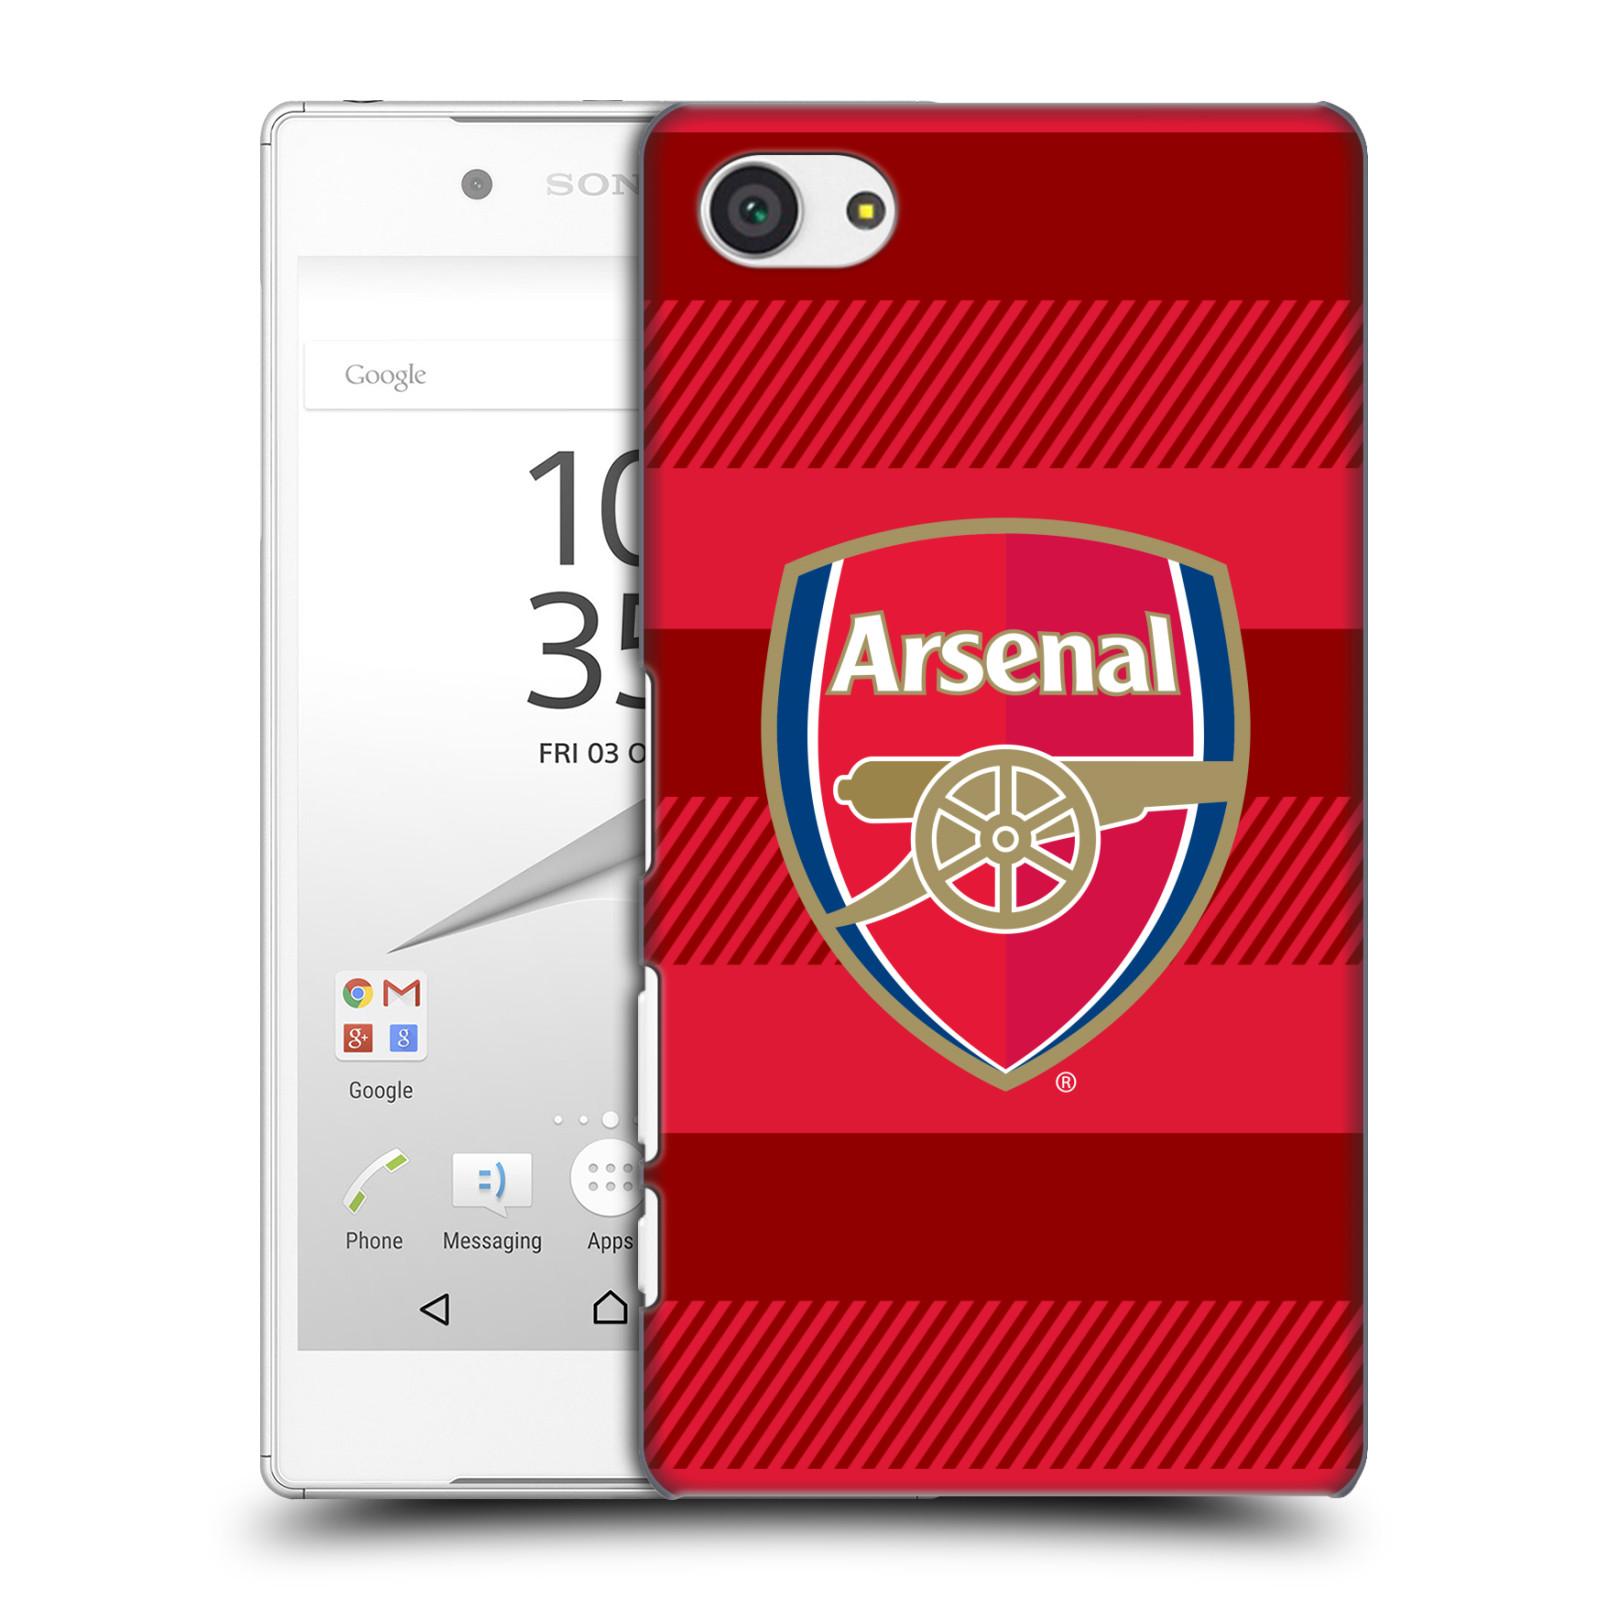 Plastové pouzdro na mobil Sony Xperia Z5 Compact - Head Case - Arsenal FC - Logo s pruhy